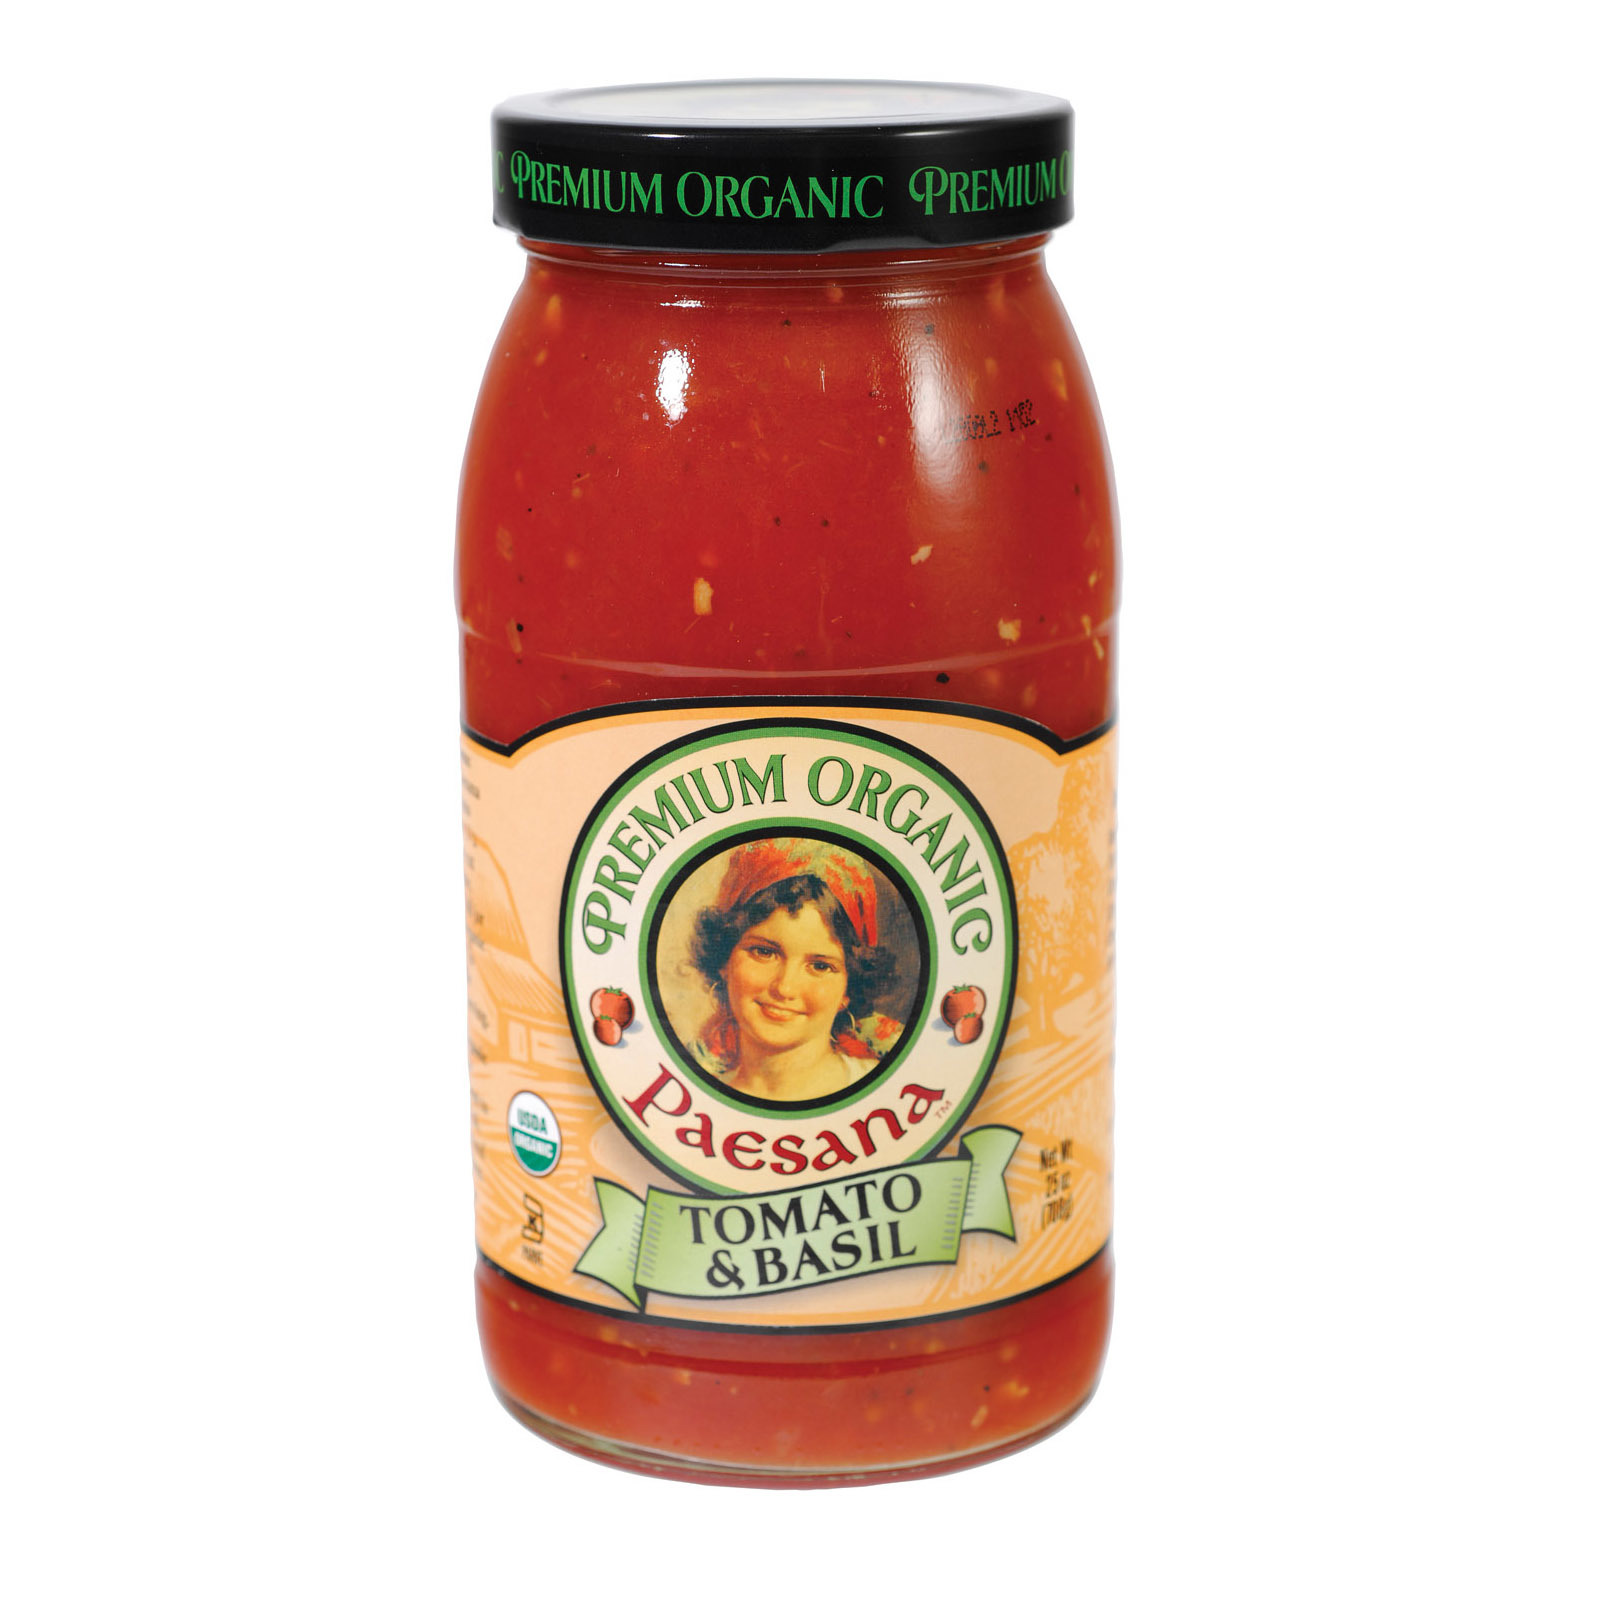 Paesana Organic Sauce - Tomato Basil - Case of 6 - 25 oz.